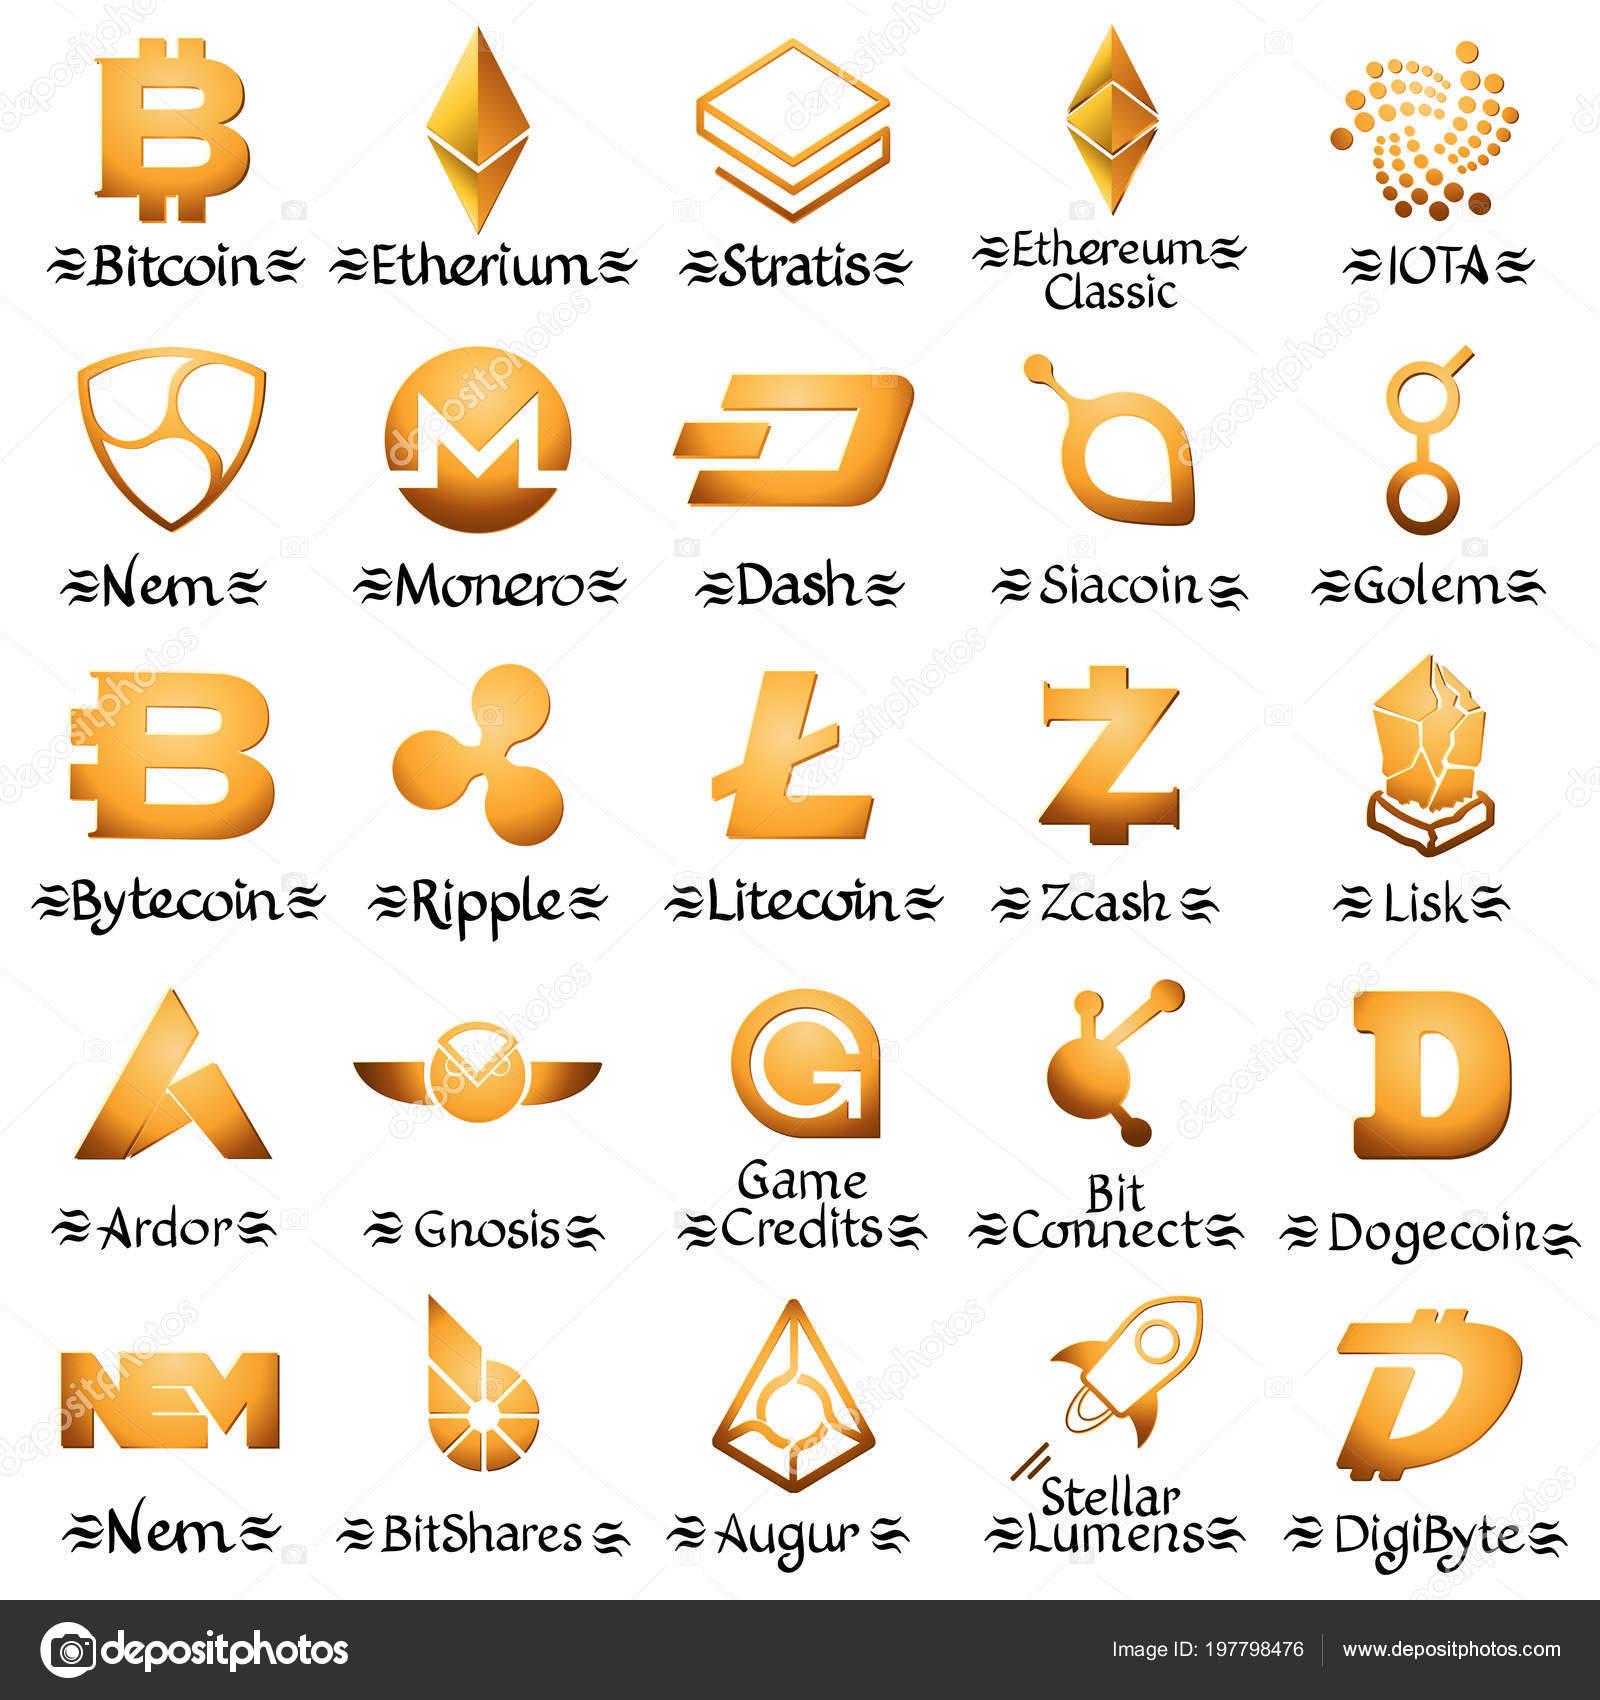 depozitare bitcoin neteller companiile de remitențe bitcoin